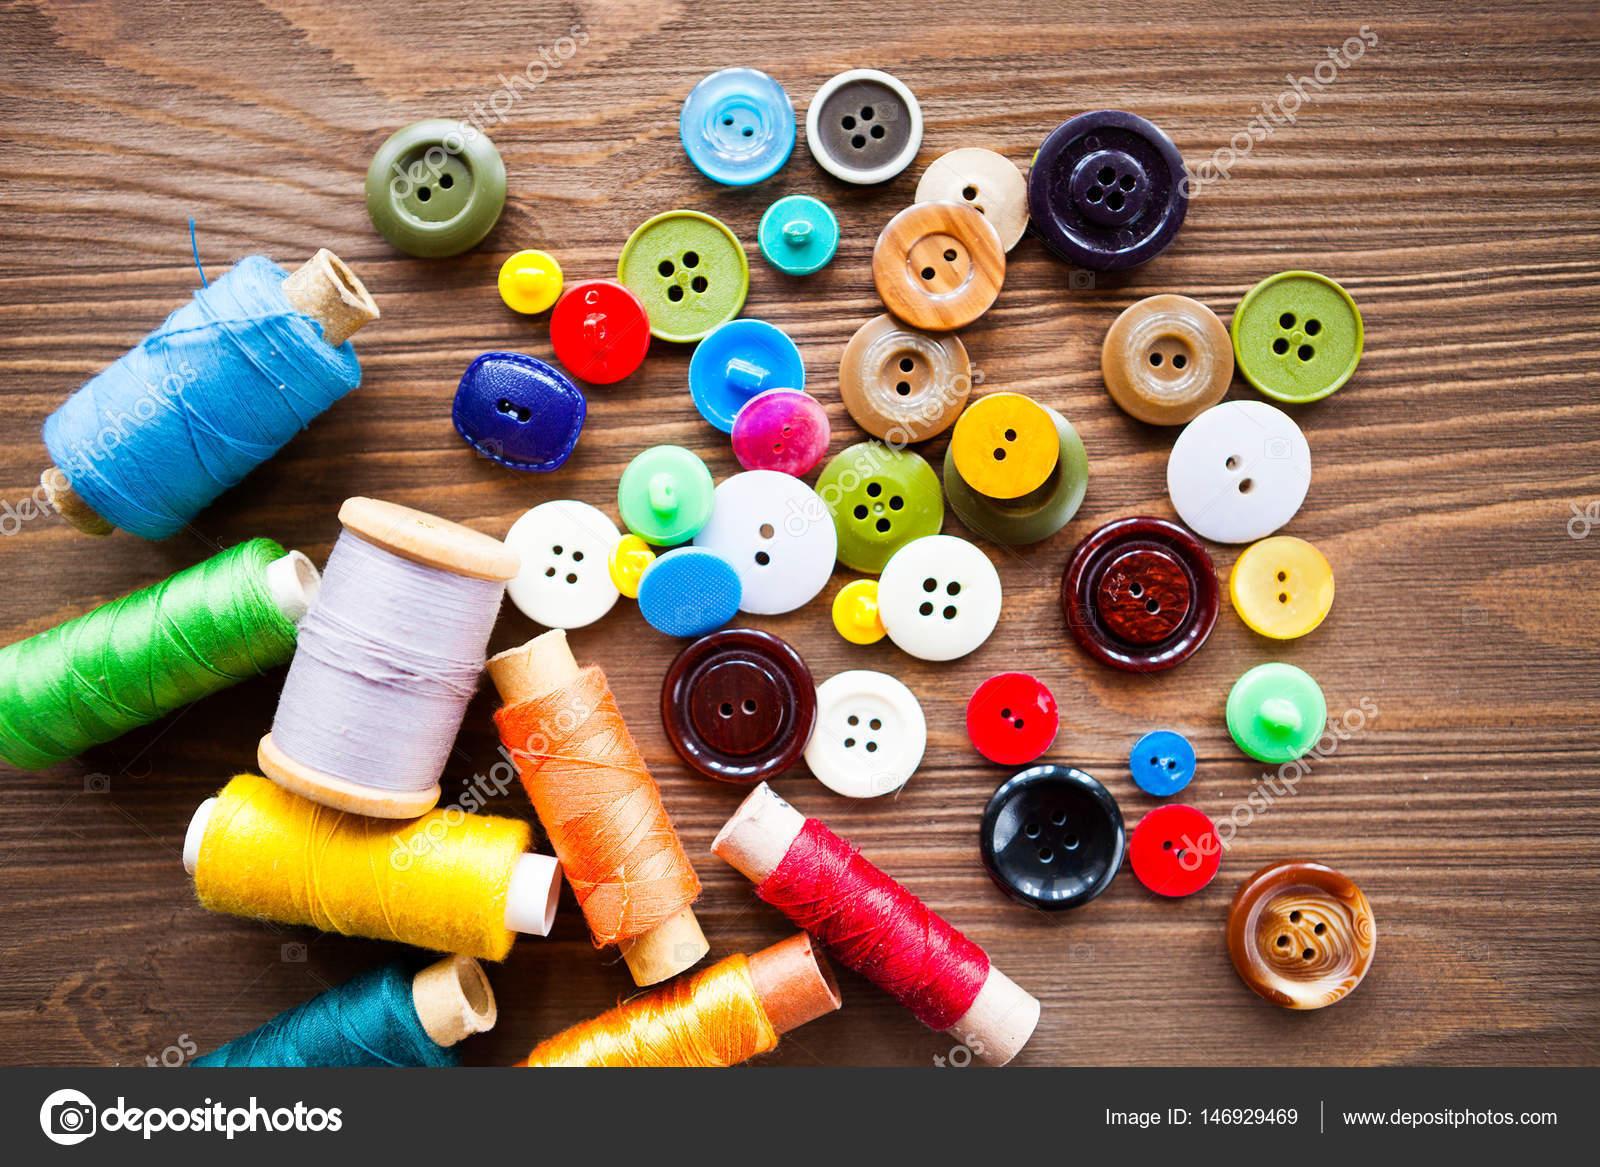 69056cbd7e95 Μοτίβο κοπής ψαλίδι, ύφασμα, σχέδια, μετροταινία, μασούρια κλωστής, κουμπιά  χρειάζεται ράψιμο ρούχα. Στοιχεία για την προσαρμογή — Εικόνα από ...